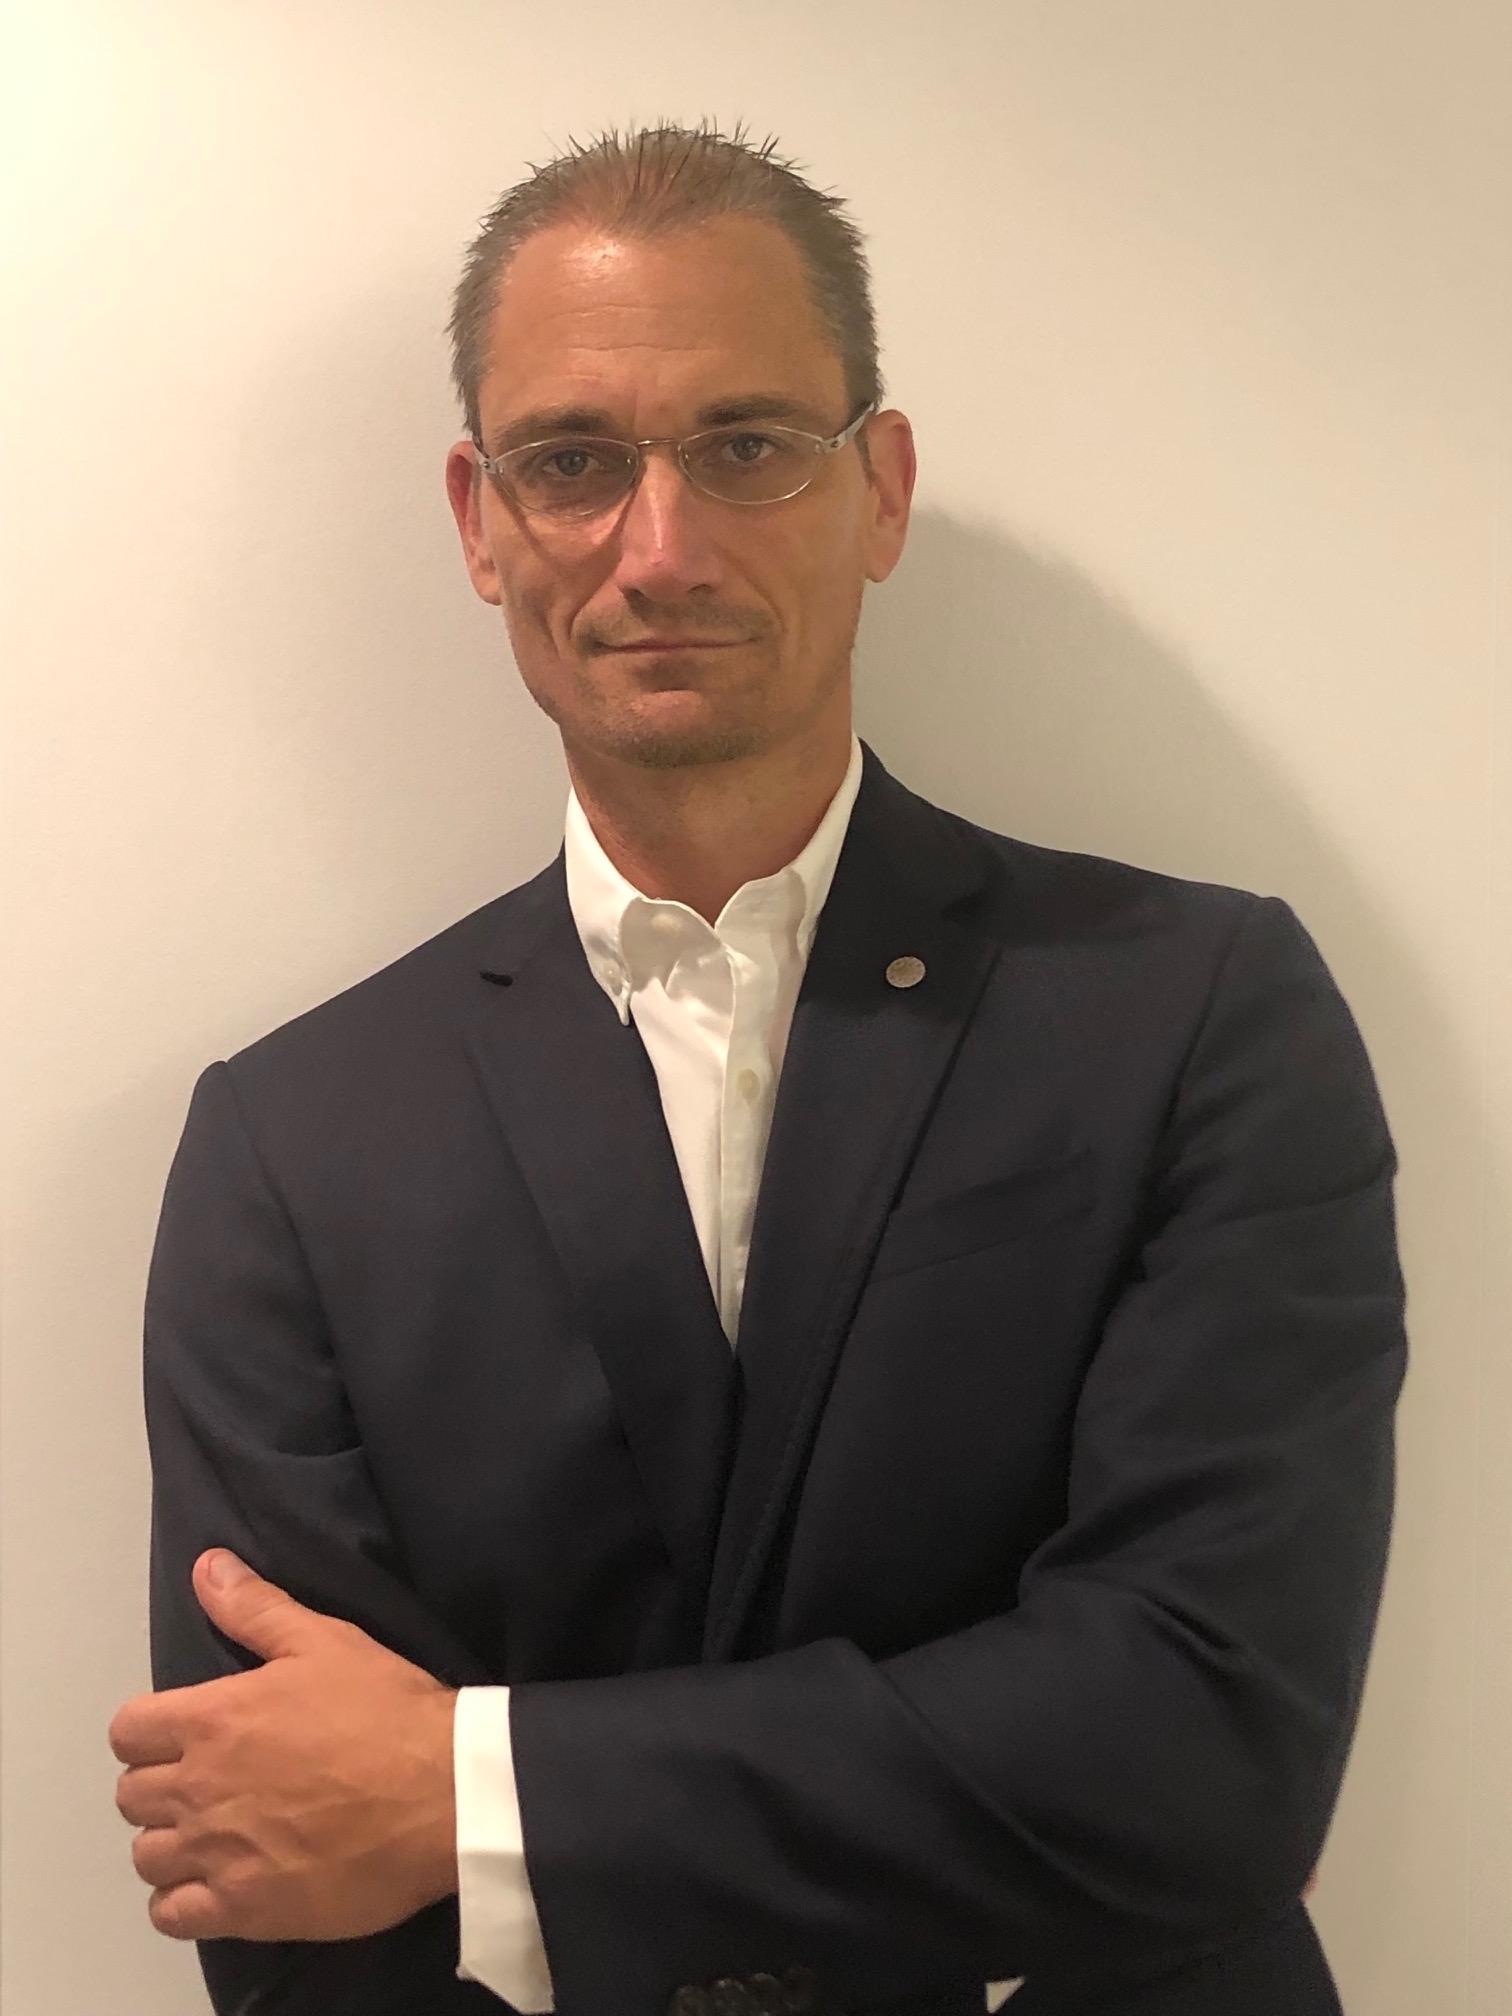 James Schildknecht